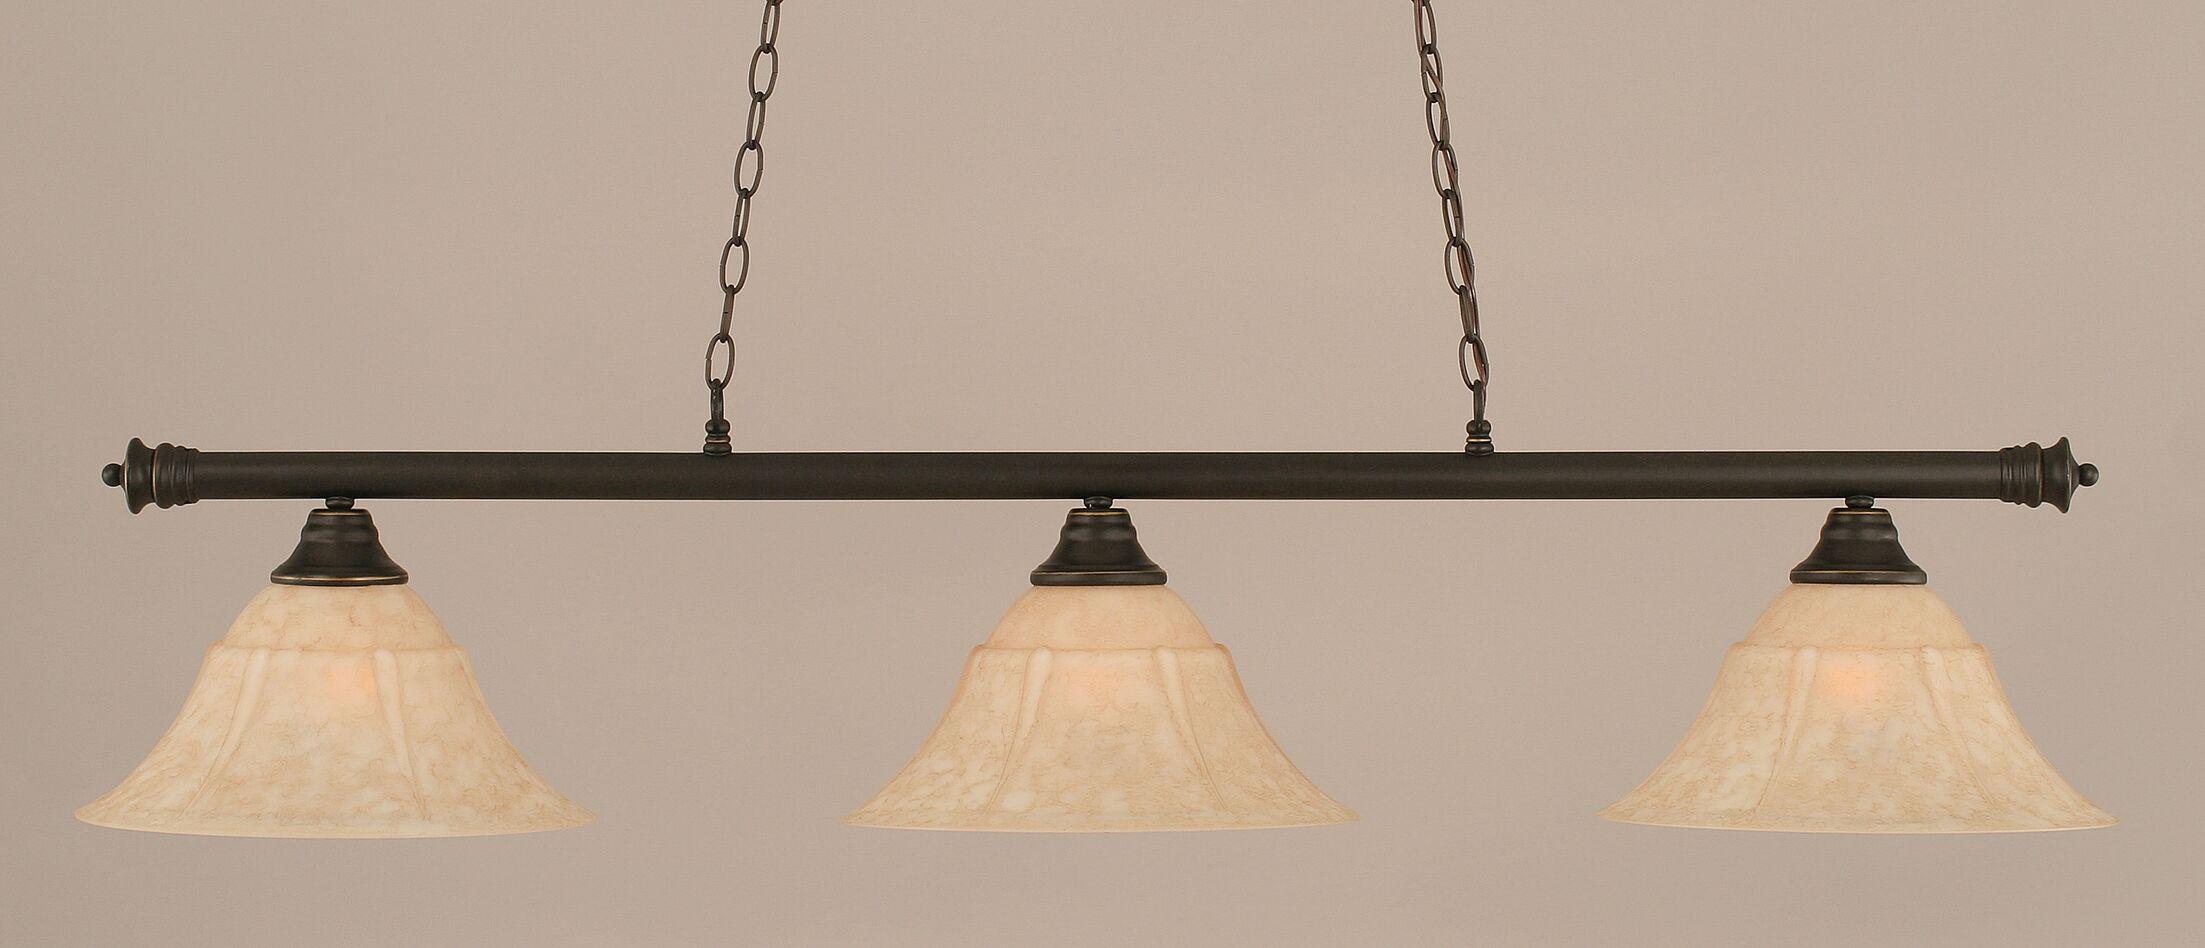 Mendez 3-Light Billiard Light Finish: Dark Granite, Size: 12